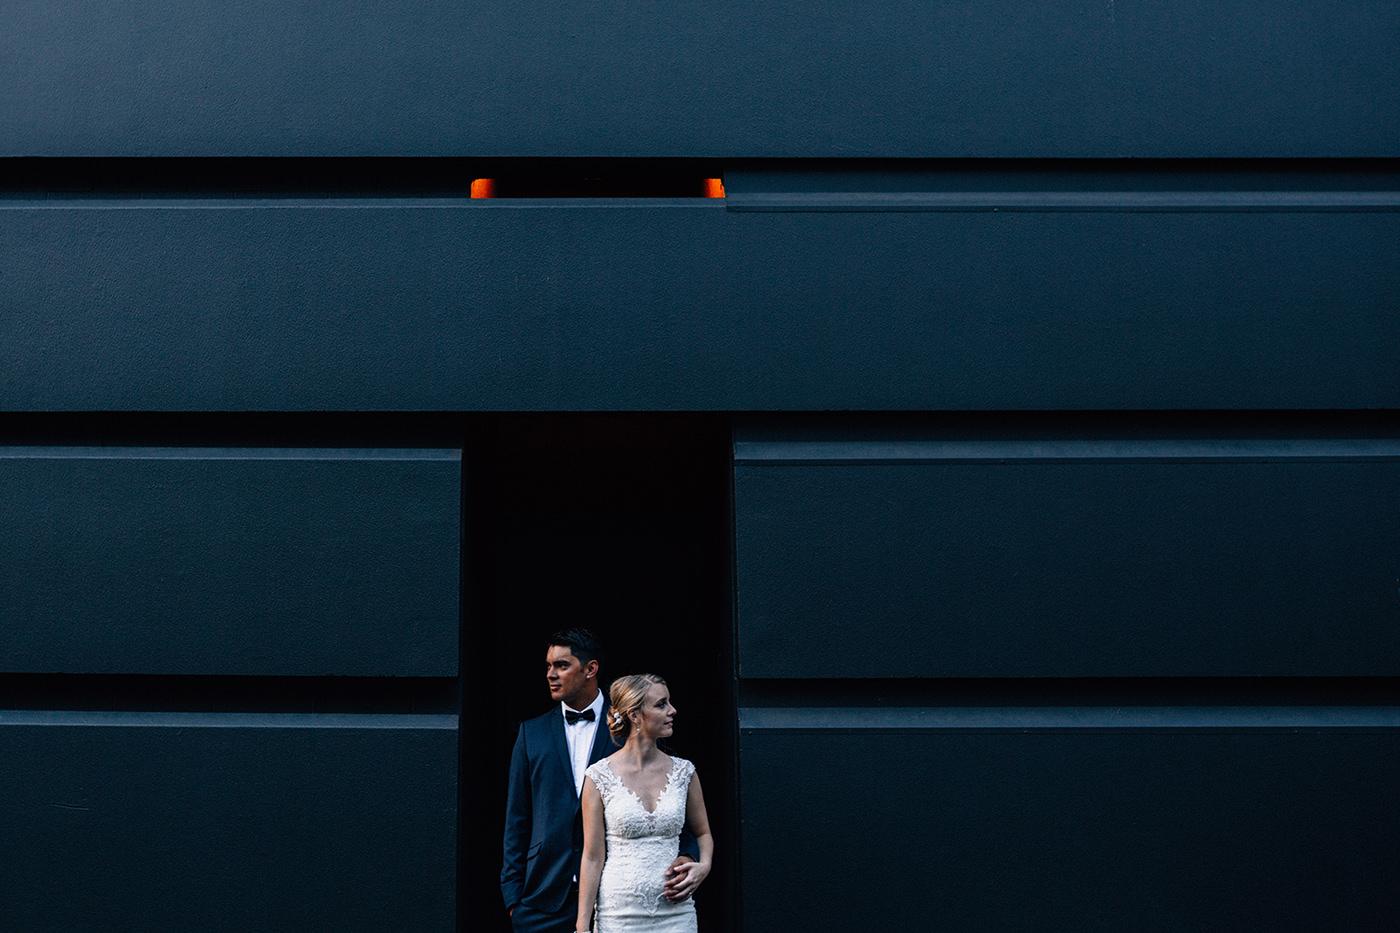 wedding_photographer_nz-00012.jpg